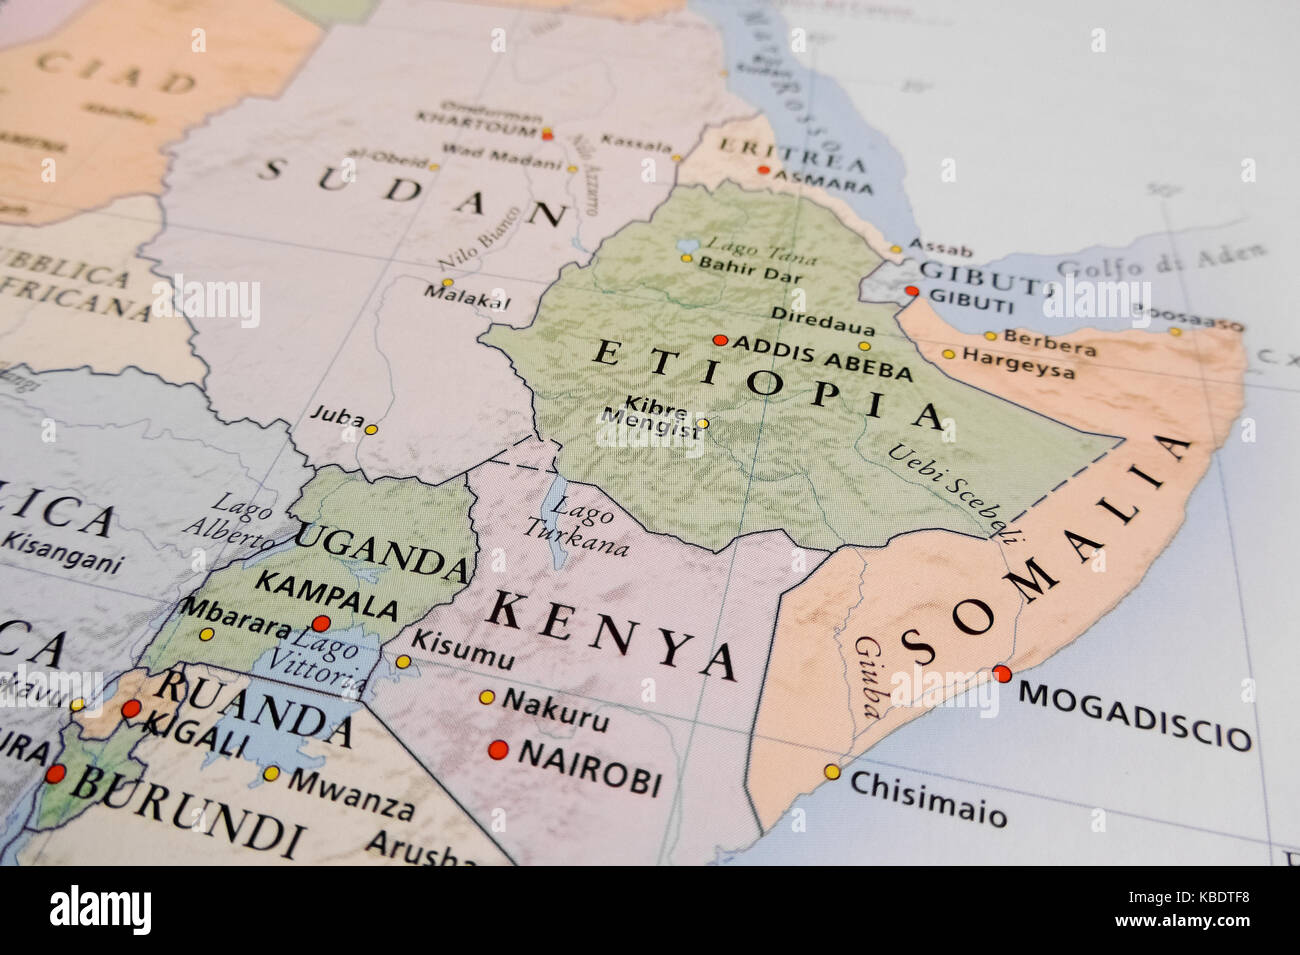 Africa Map Congo River%0A Africa Map Zambezi River Eastern Africa map Stock Image